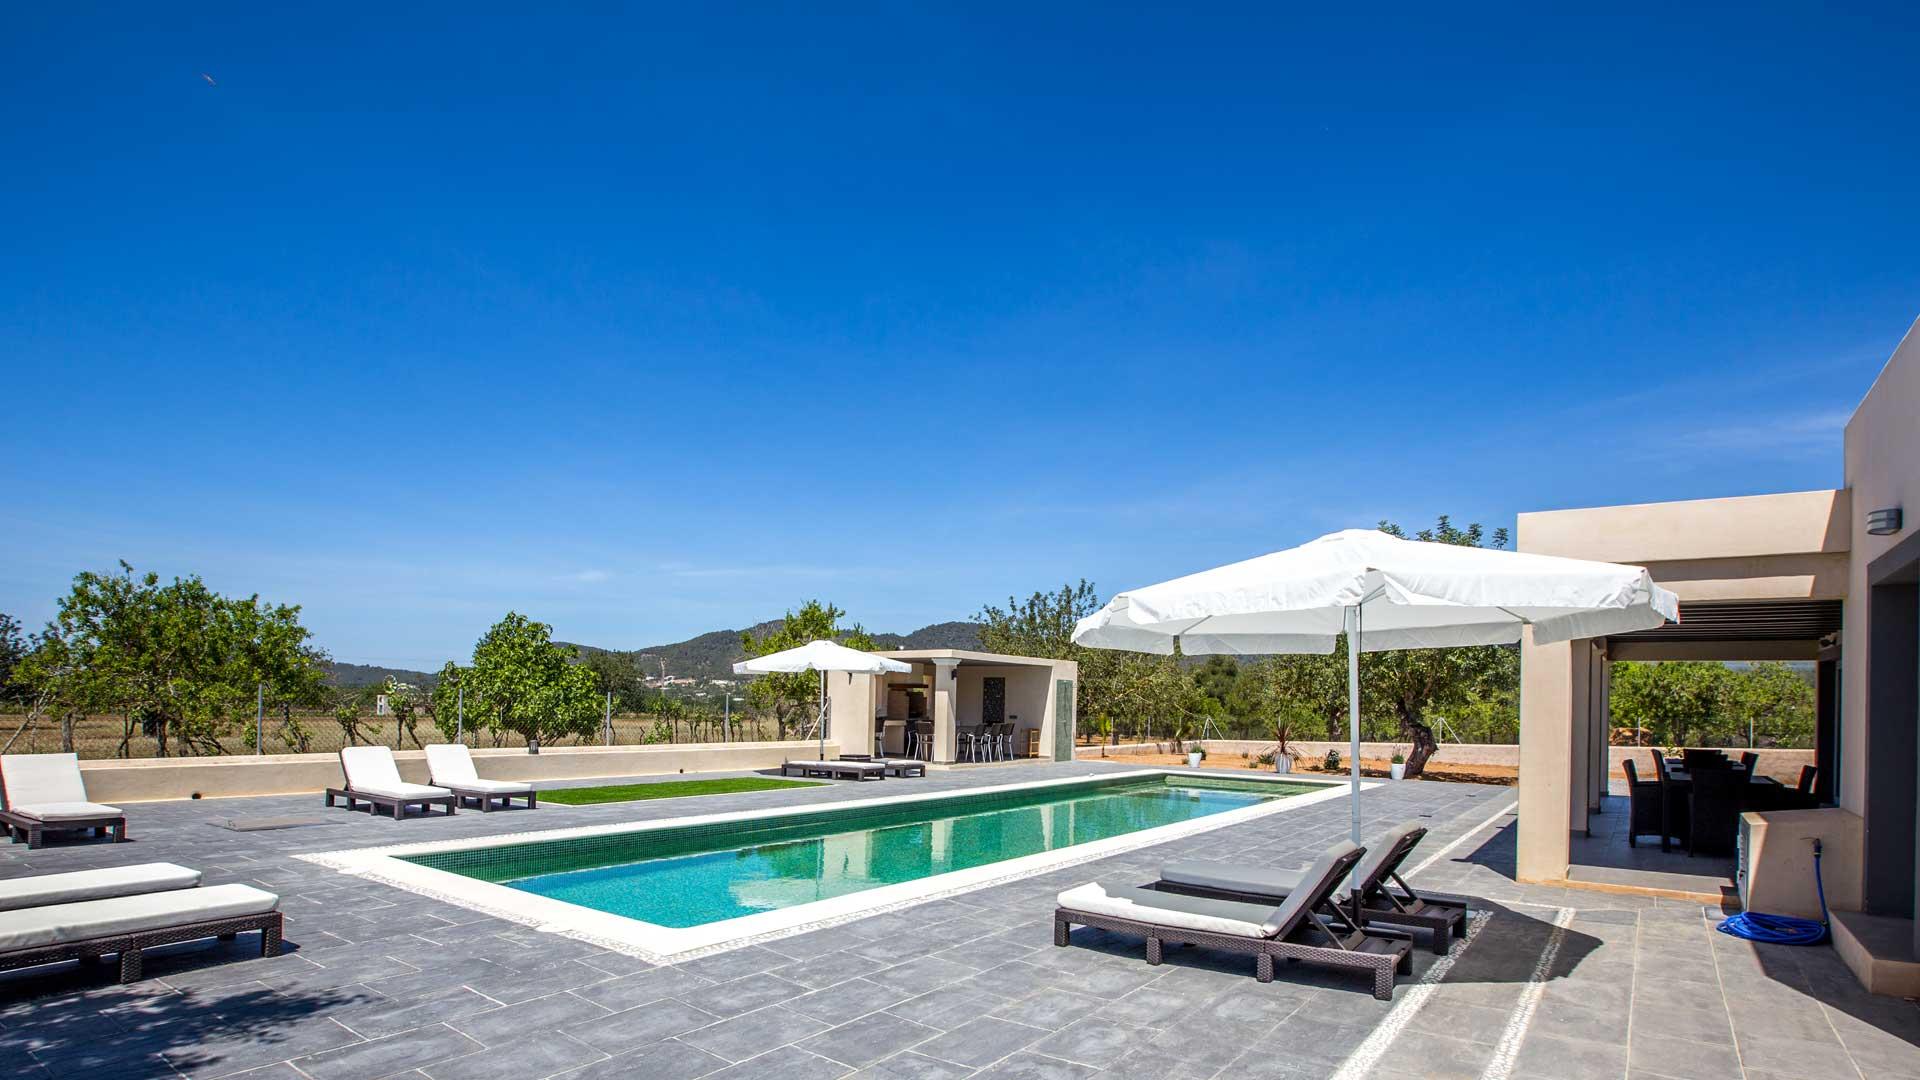 villa 836 villa mieten in ibiza ibiza westen villanovo. Black Bedroom Furniture Sets. Home Design Ideas